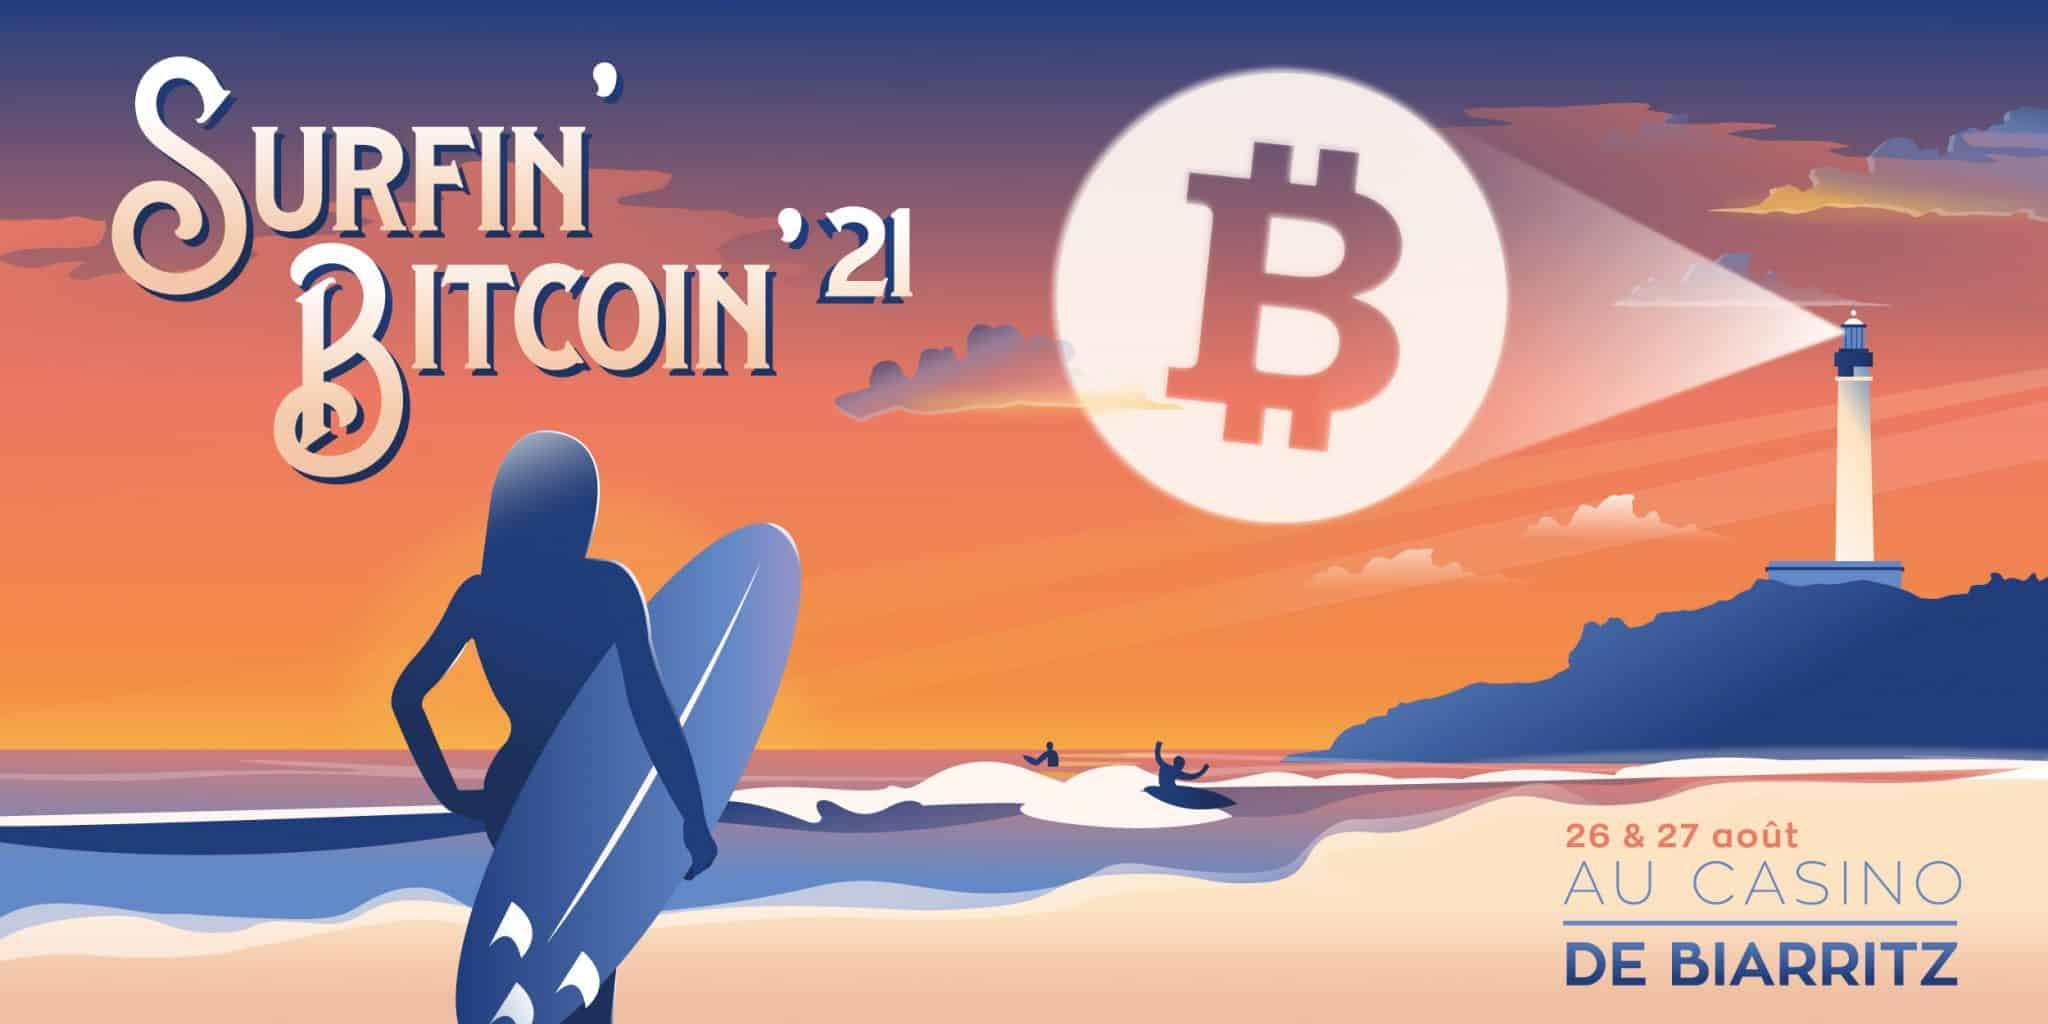 Surfin'Bitcoin event